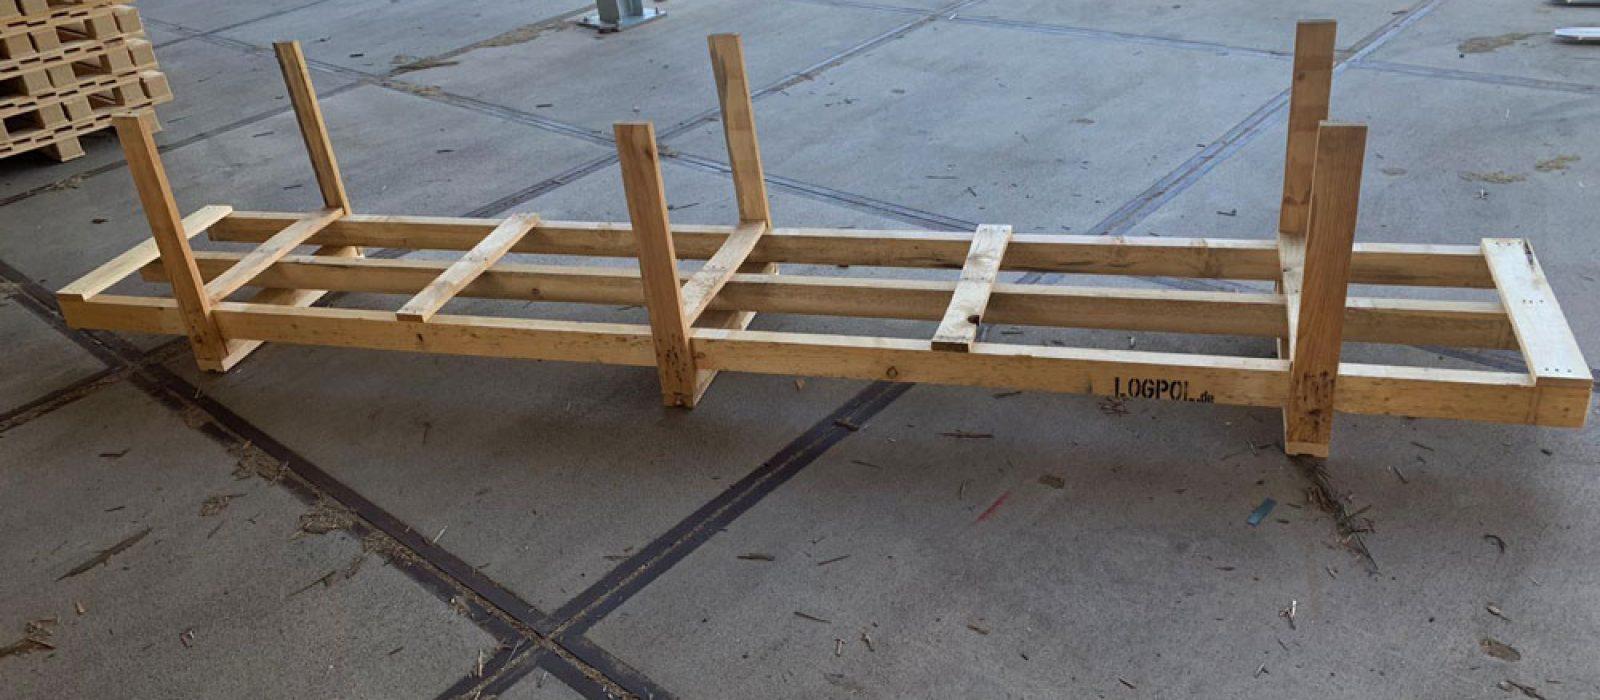 Holzpalette-Langgut-4000×750-mm-LOGPOL